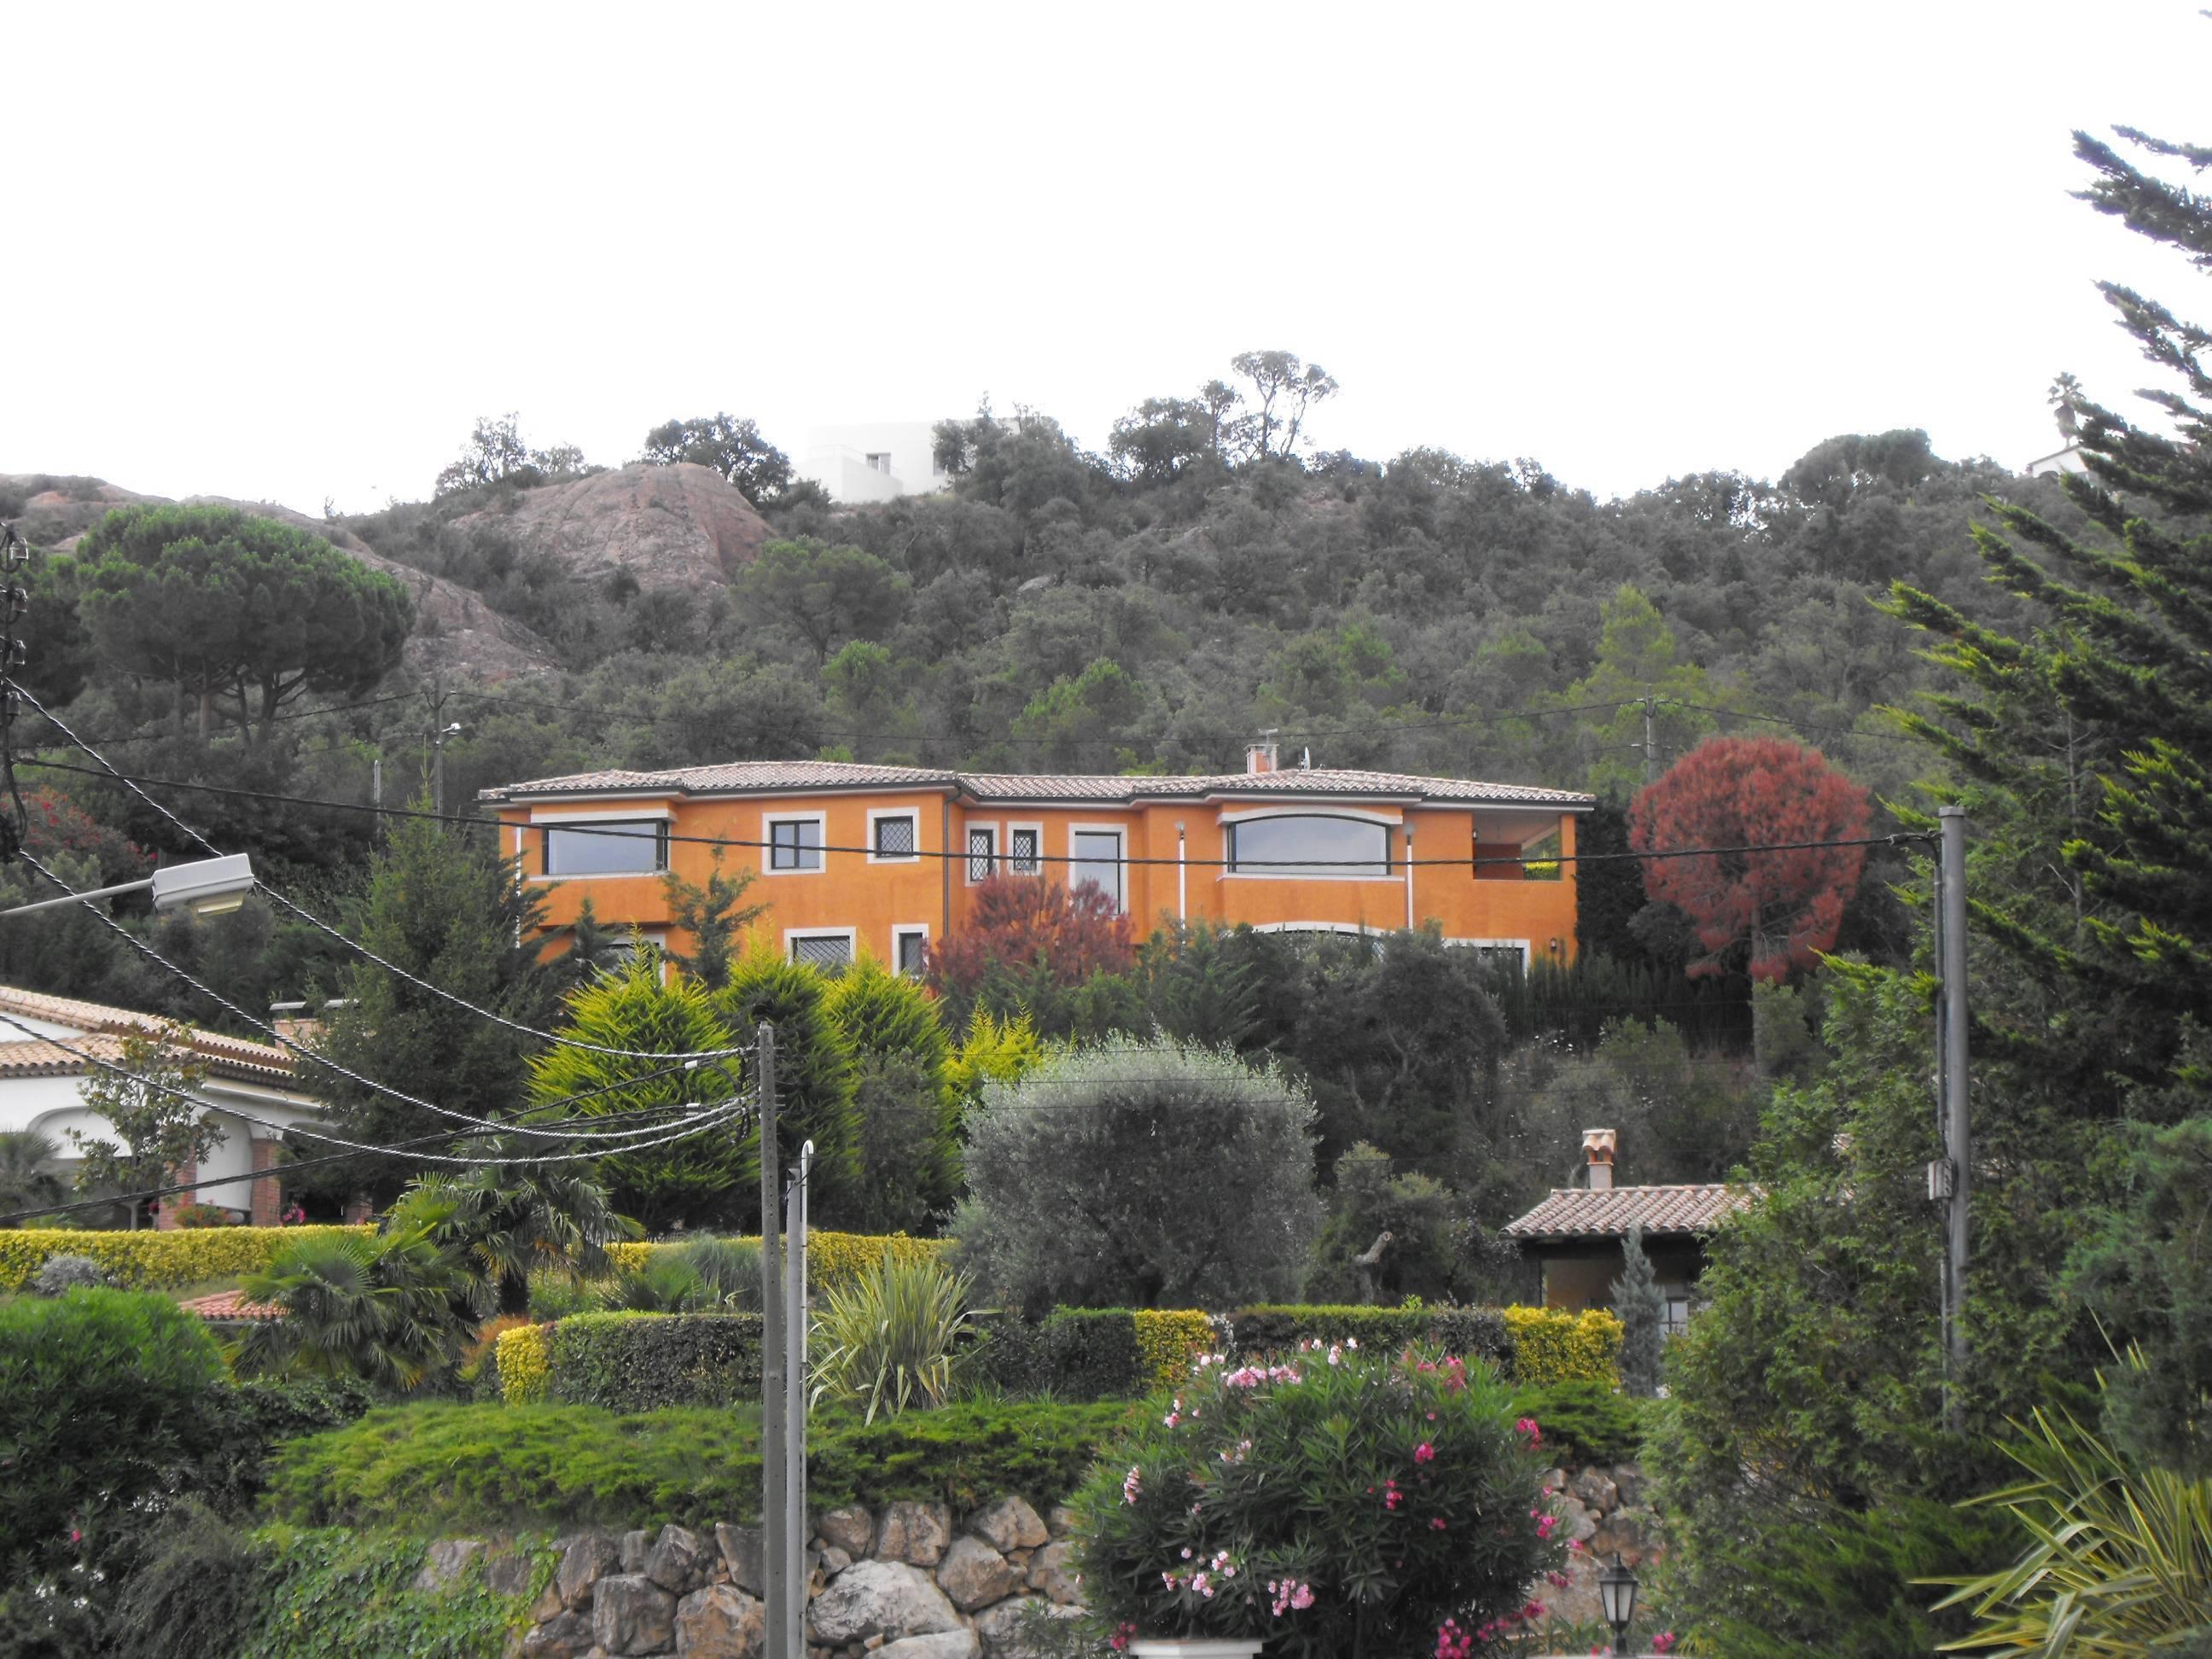 Santa Cristina De Aro Spain  City pictures : Villa for Sale Santa Cristina De Aro, Cataluna, Spain Fantastic 6 ...